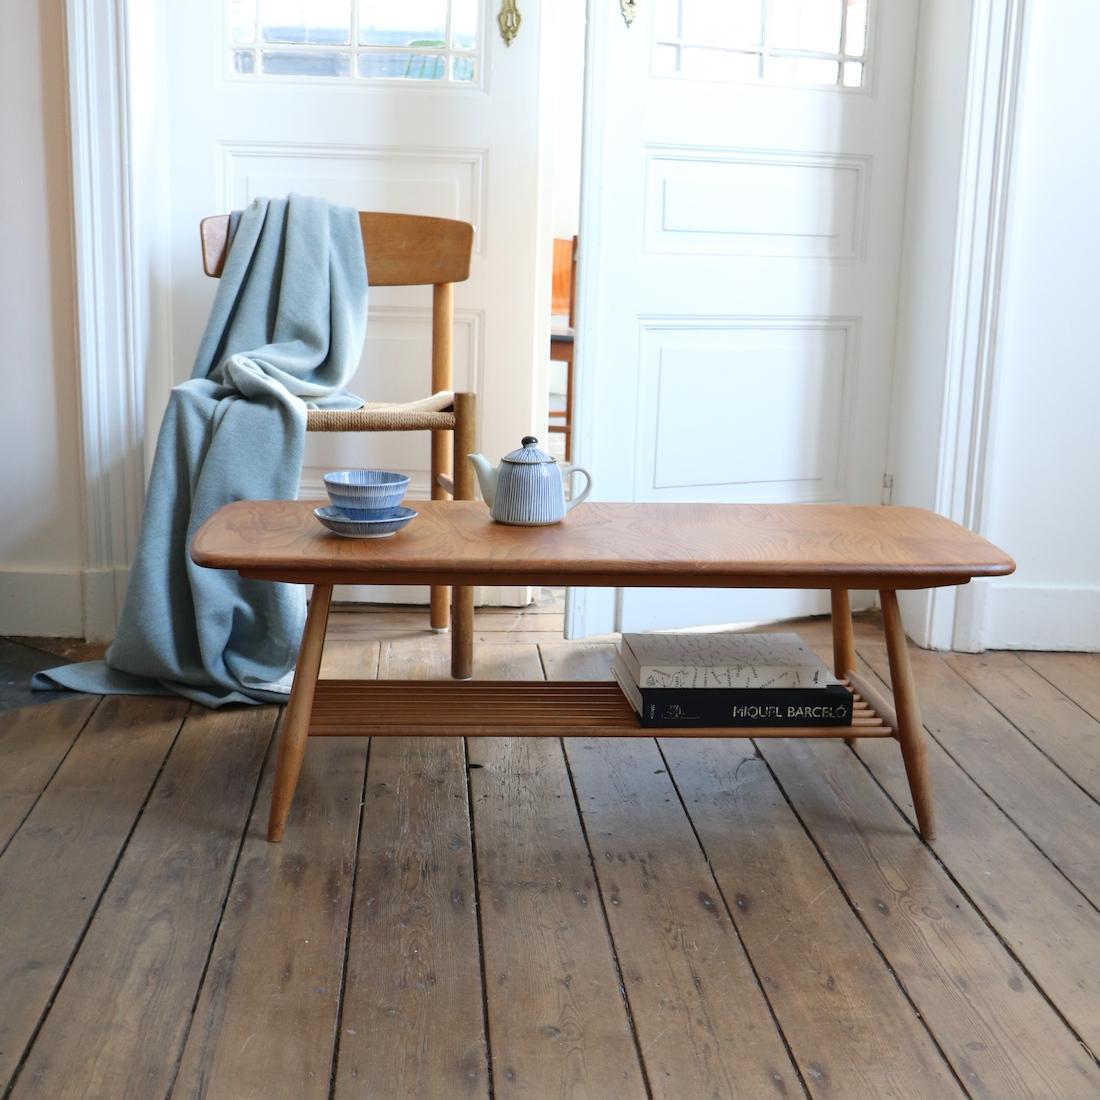 table basse ercol en orme massif la maison bruxelloise. Black Bedroom Furniture Sets. Home Design Ideas